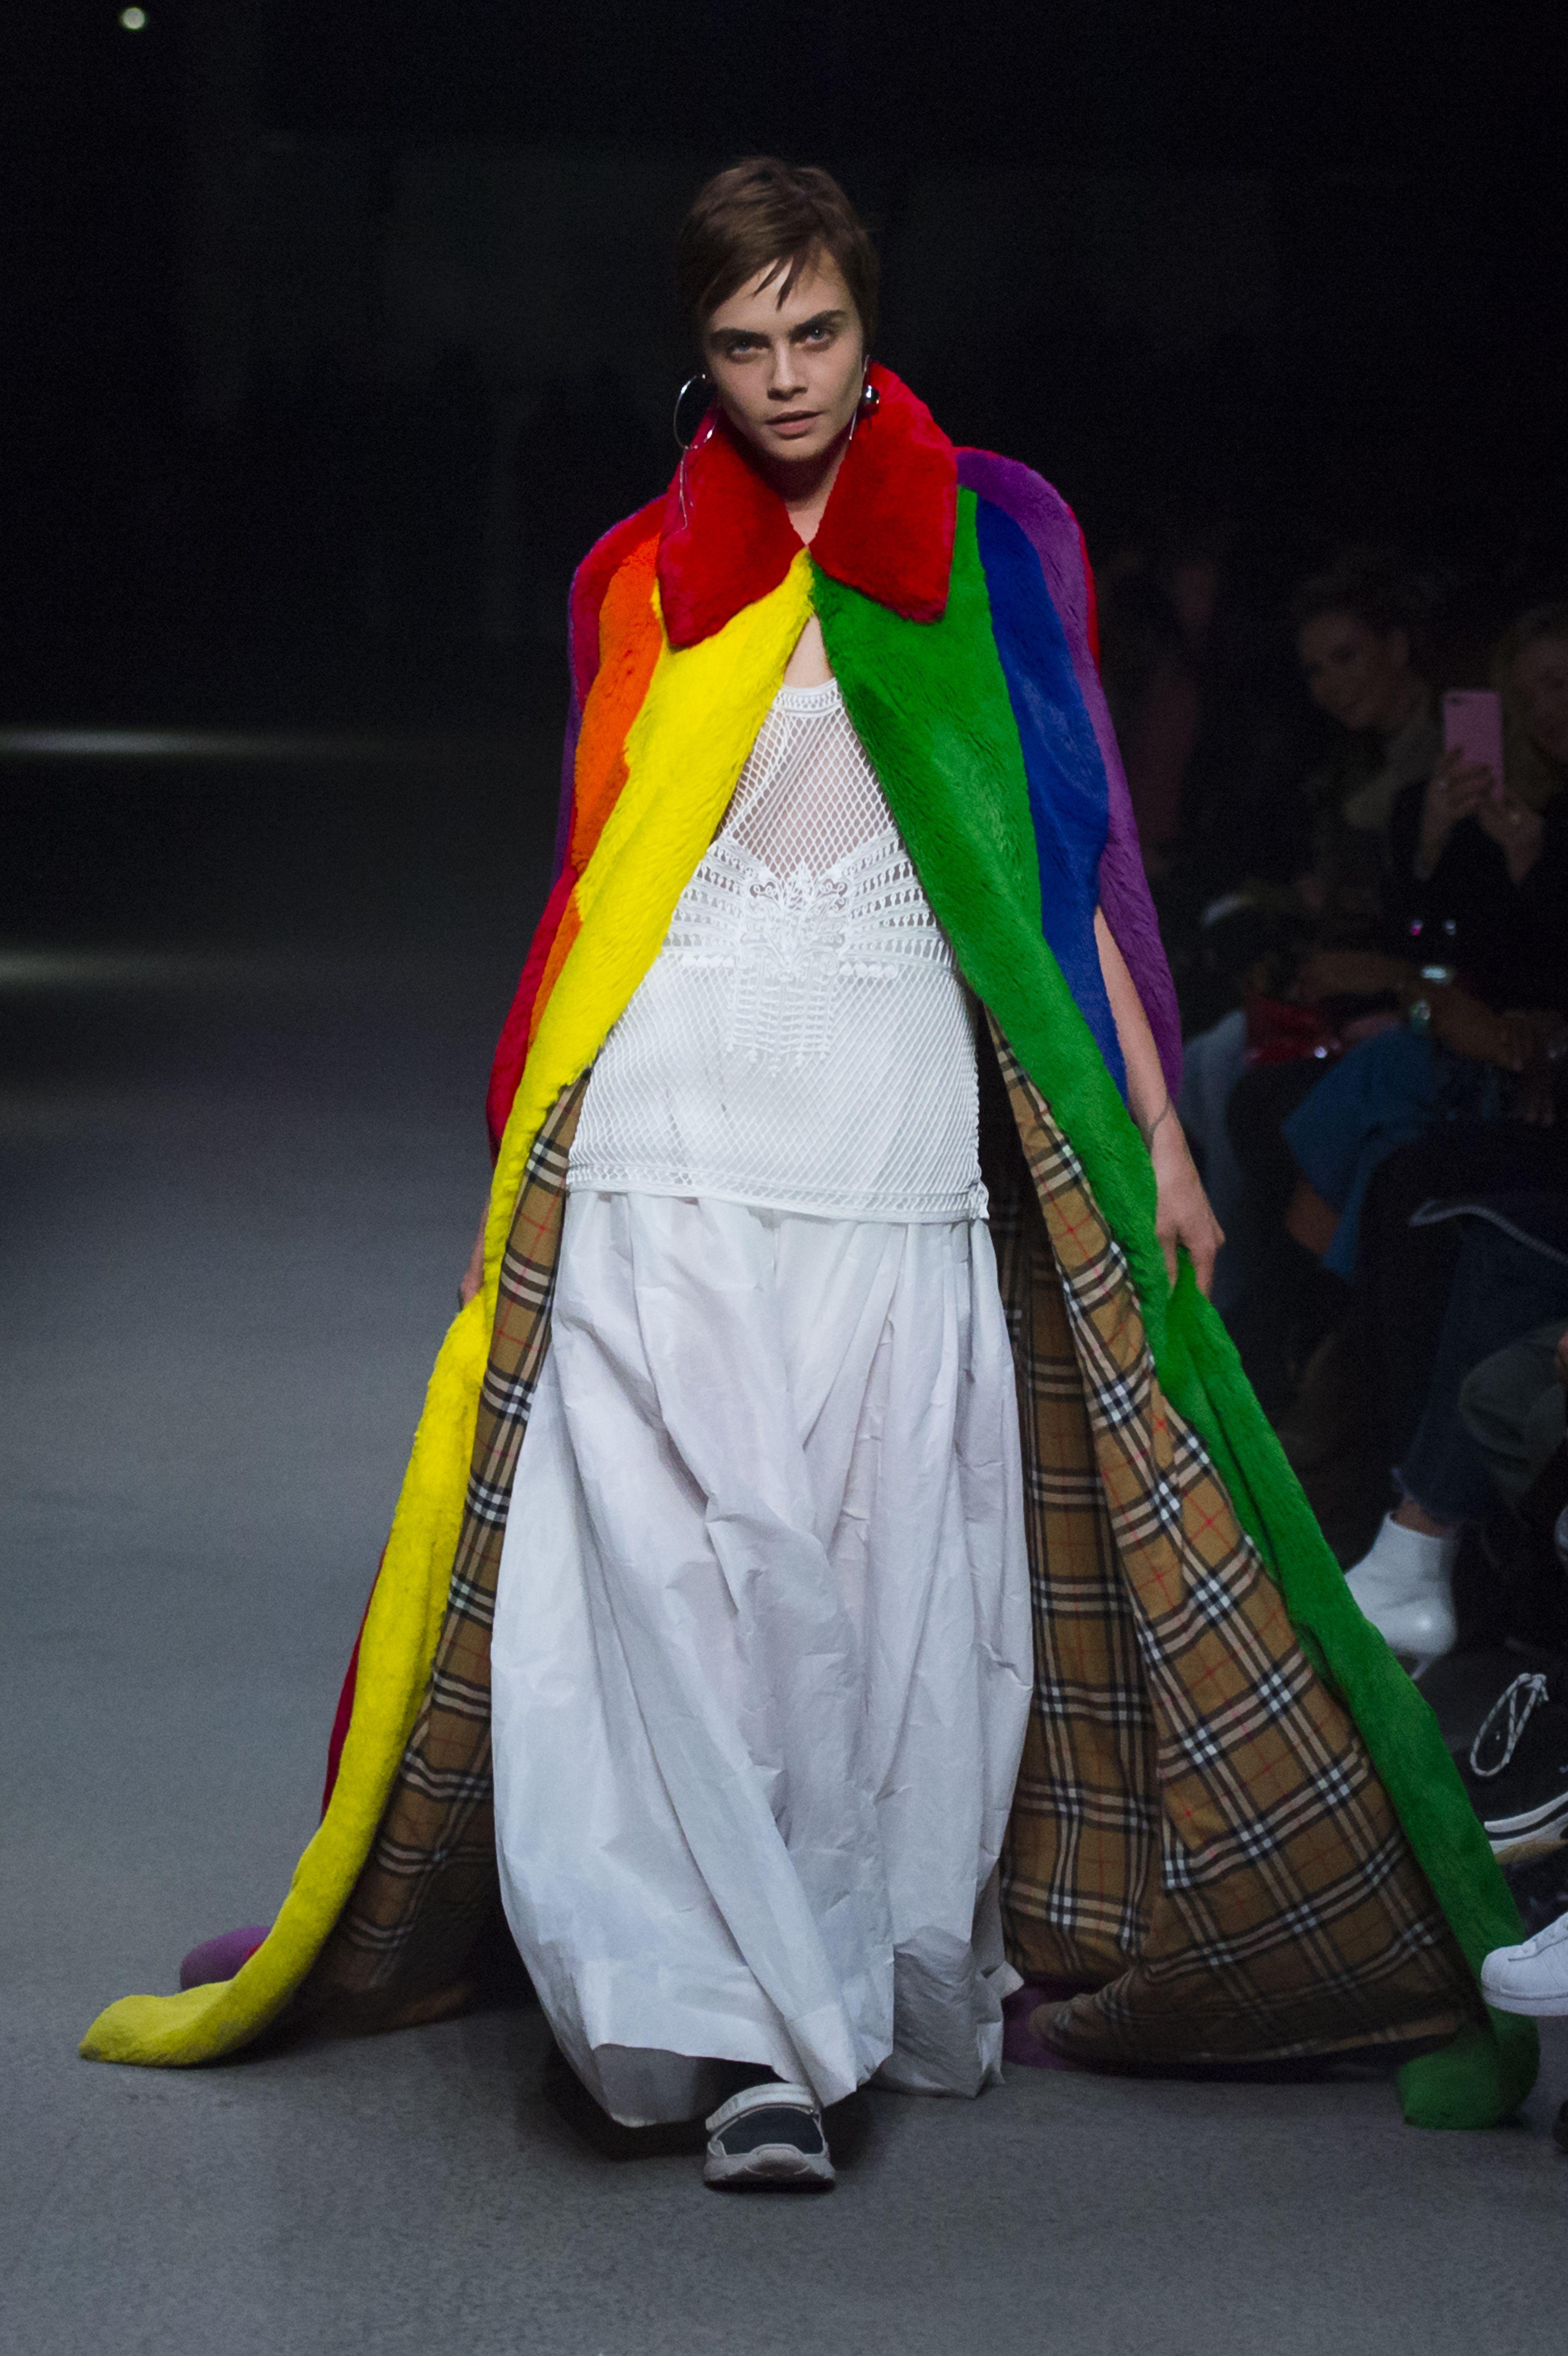 London Fashion Week: Burberry Show